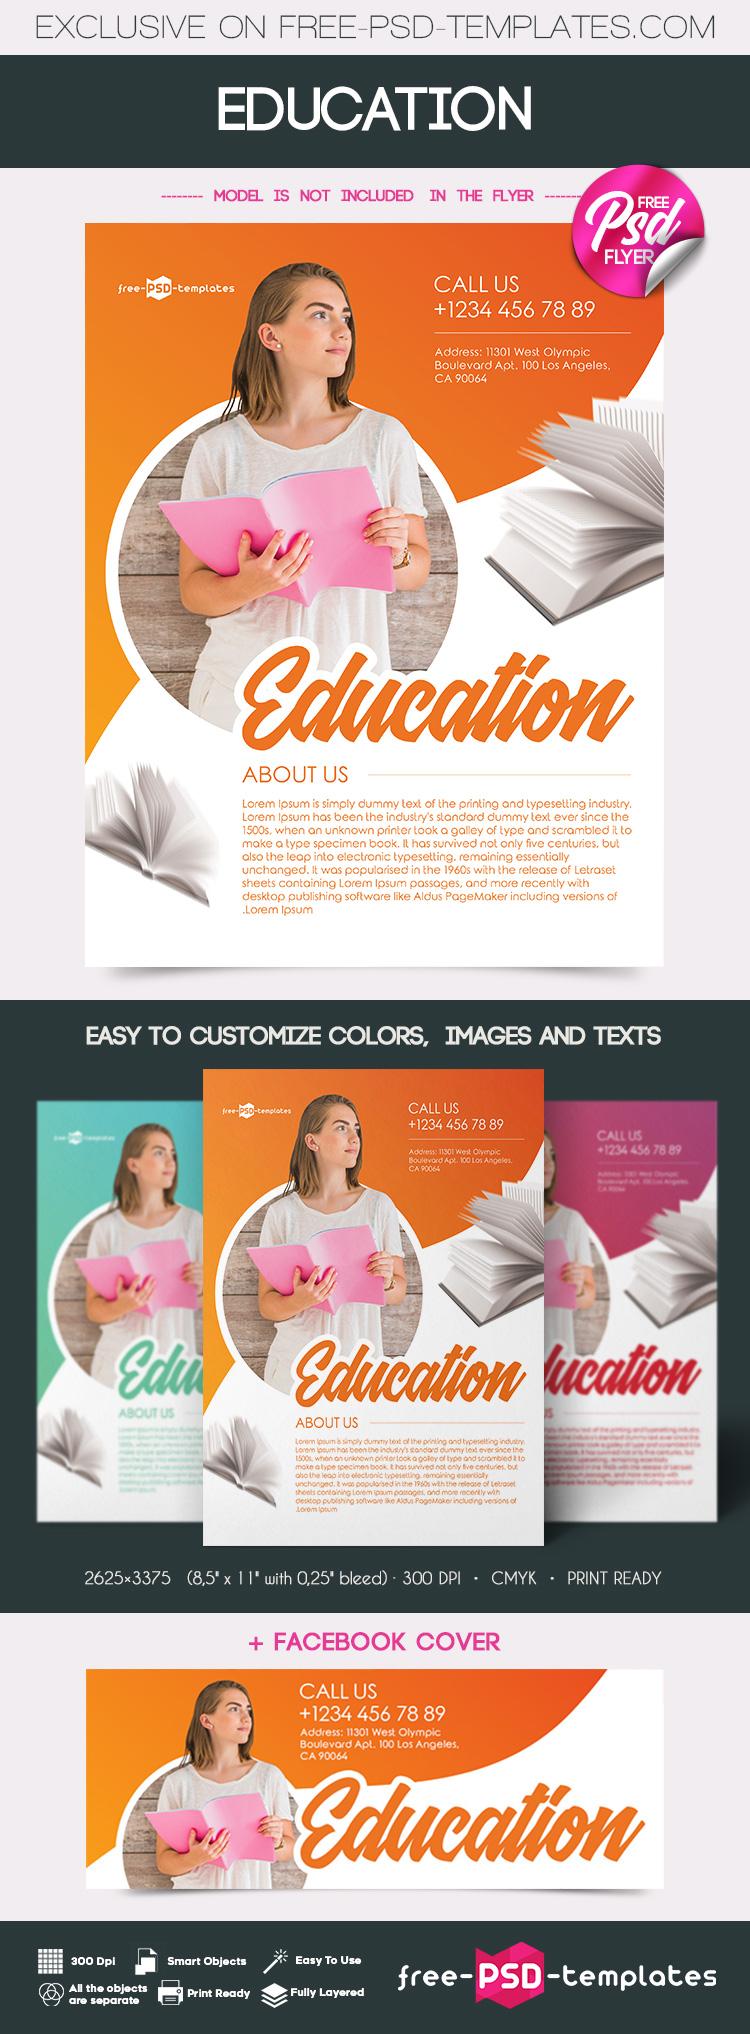 Free Education Flyer Templates Responsive Joomla And Wordpress Themes